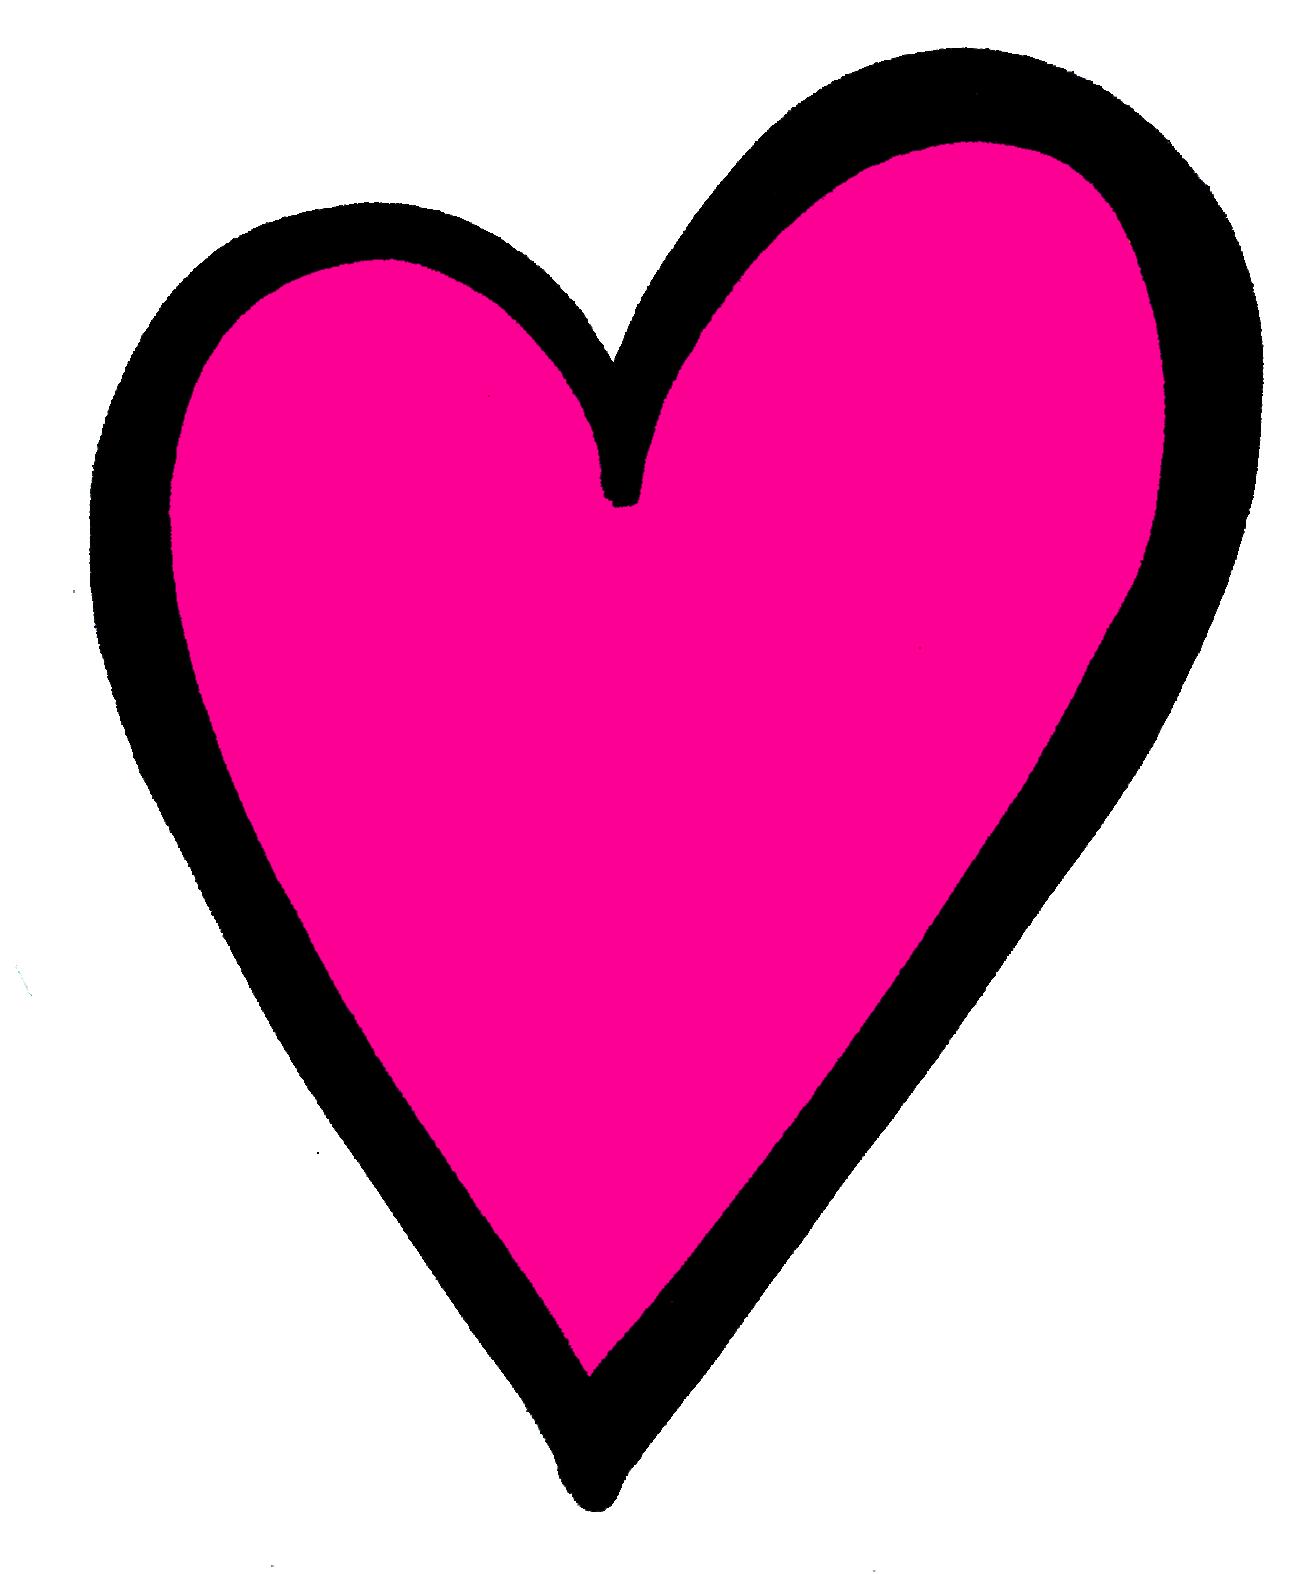 Hot Pink Heart PNG Transparent Image SVG Clip arts